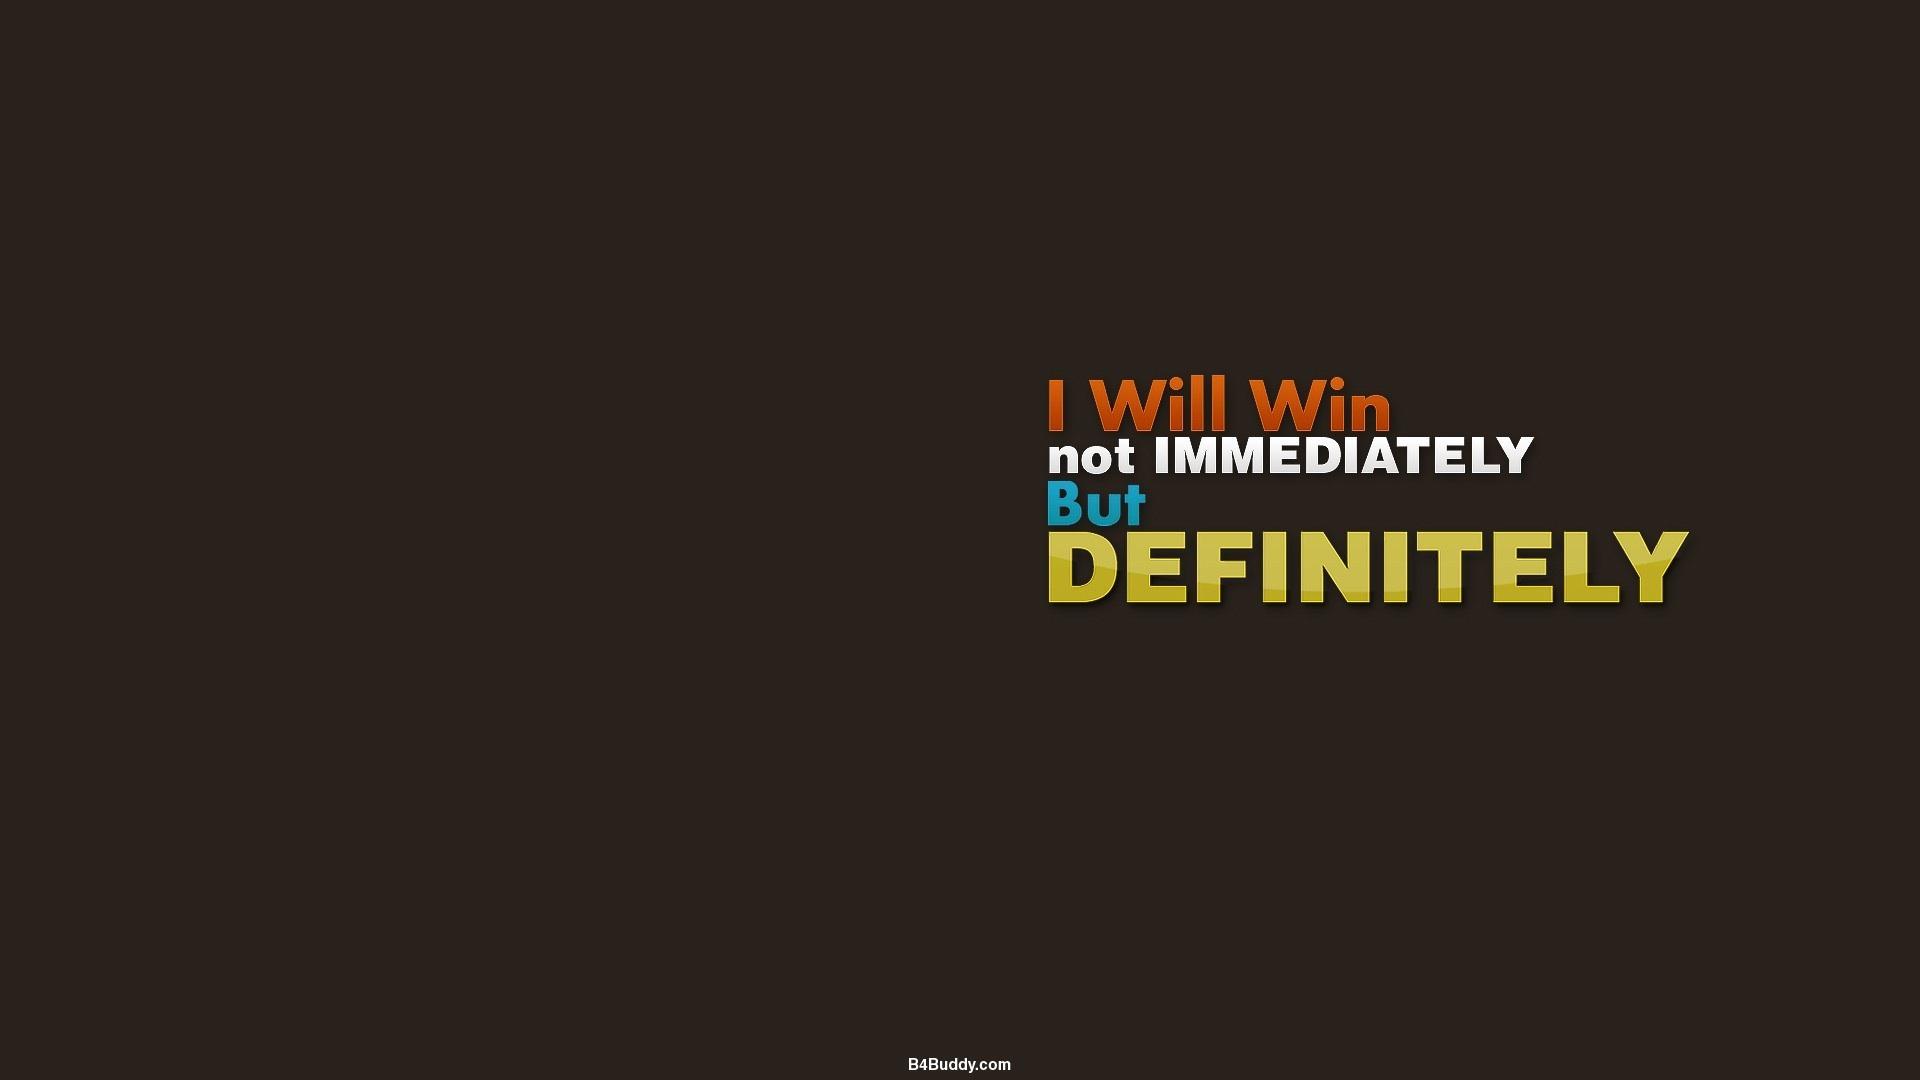 1920x1080 motivational quote wallpaper desktop pc and mac wallpaper